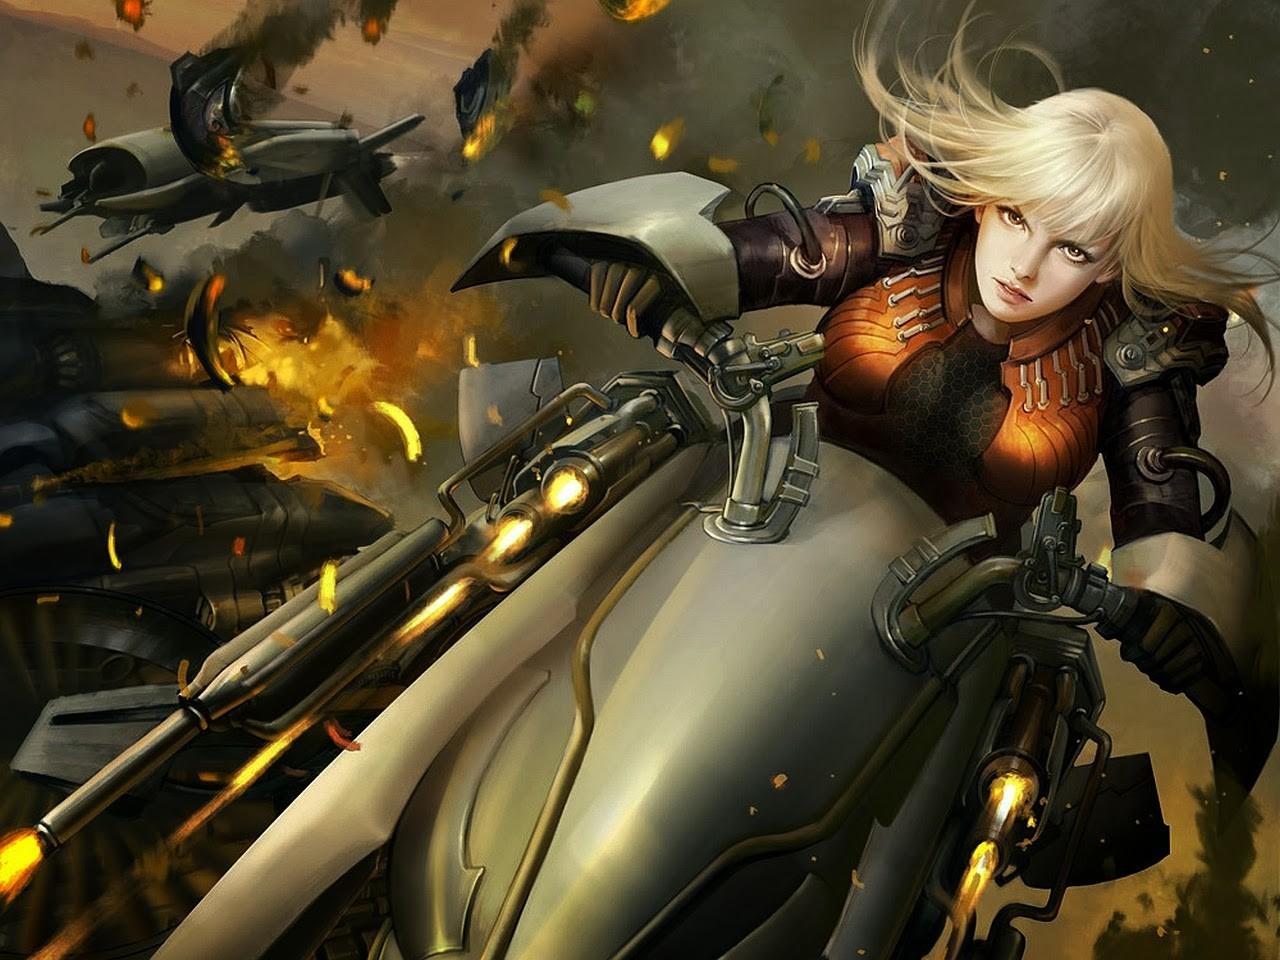 General 1280x960 vehicle science fiction battle blonde artwork women